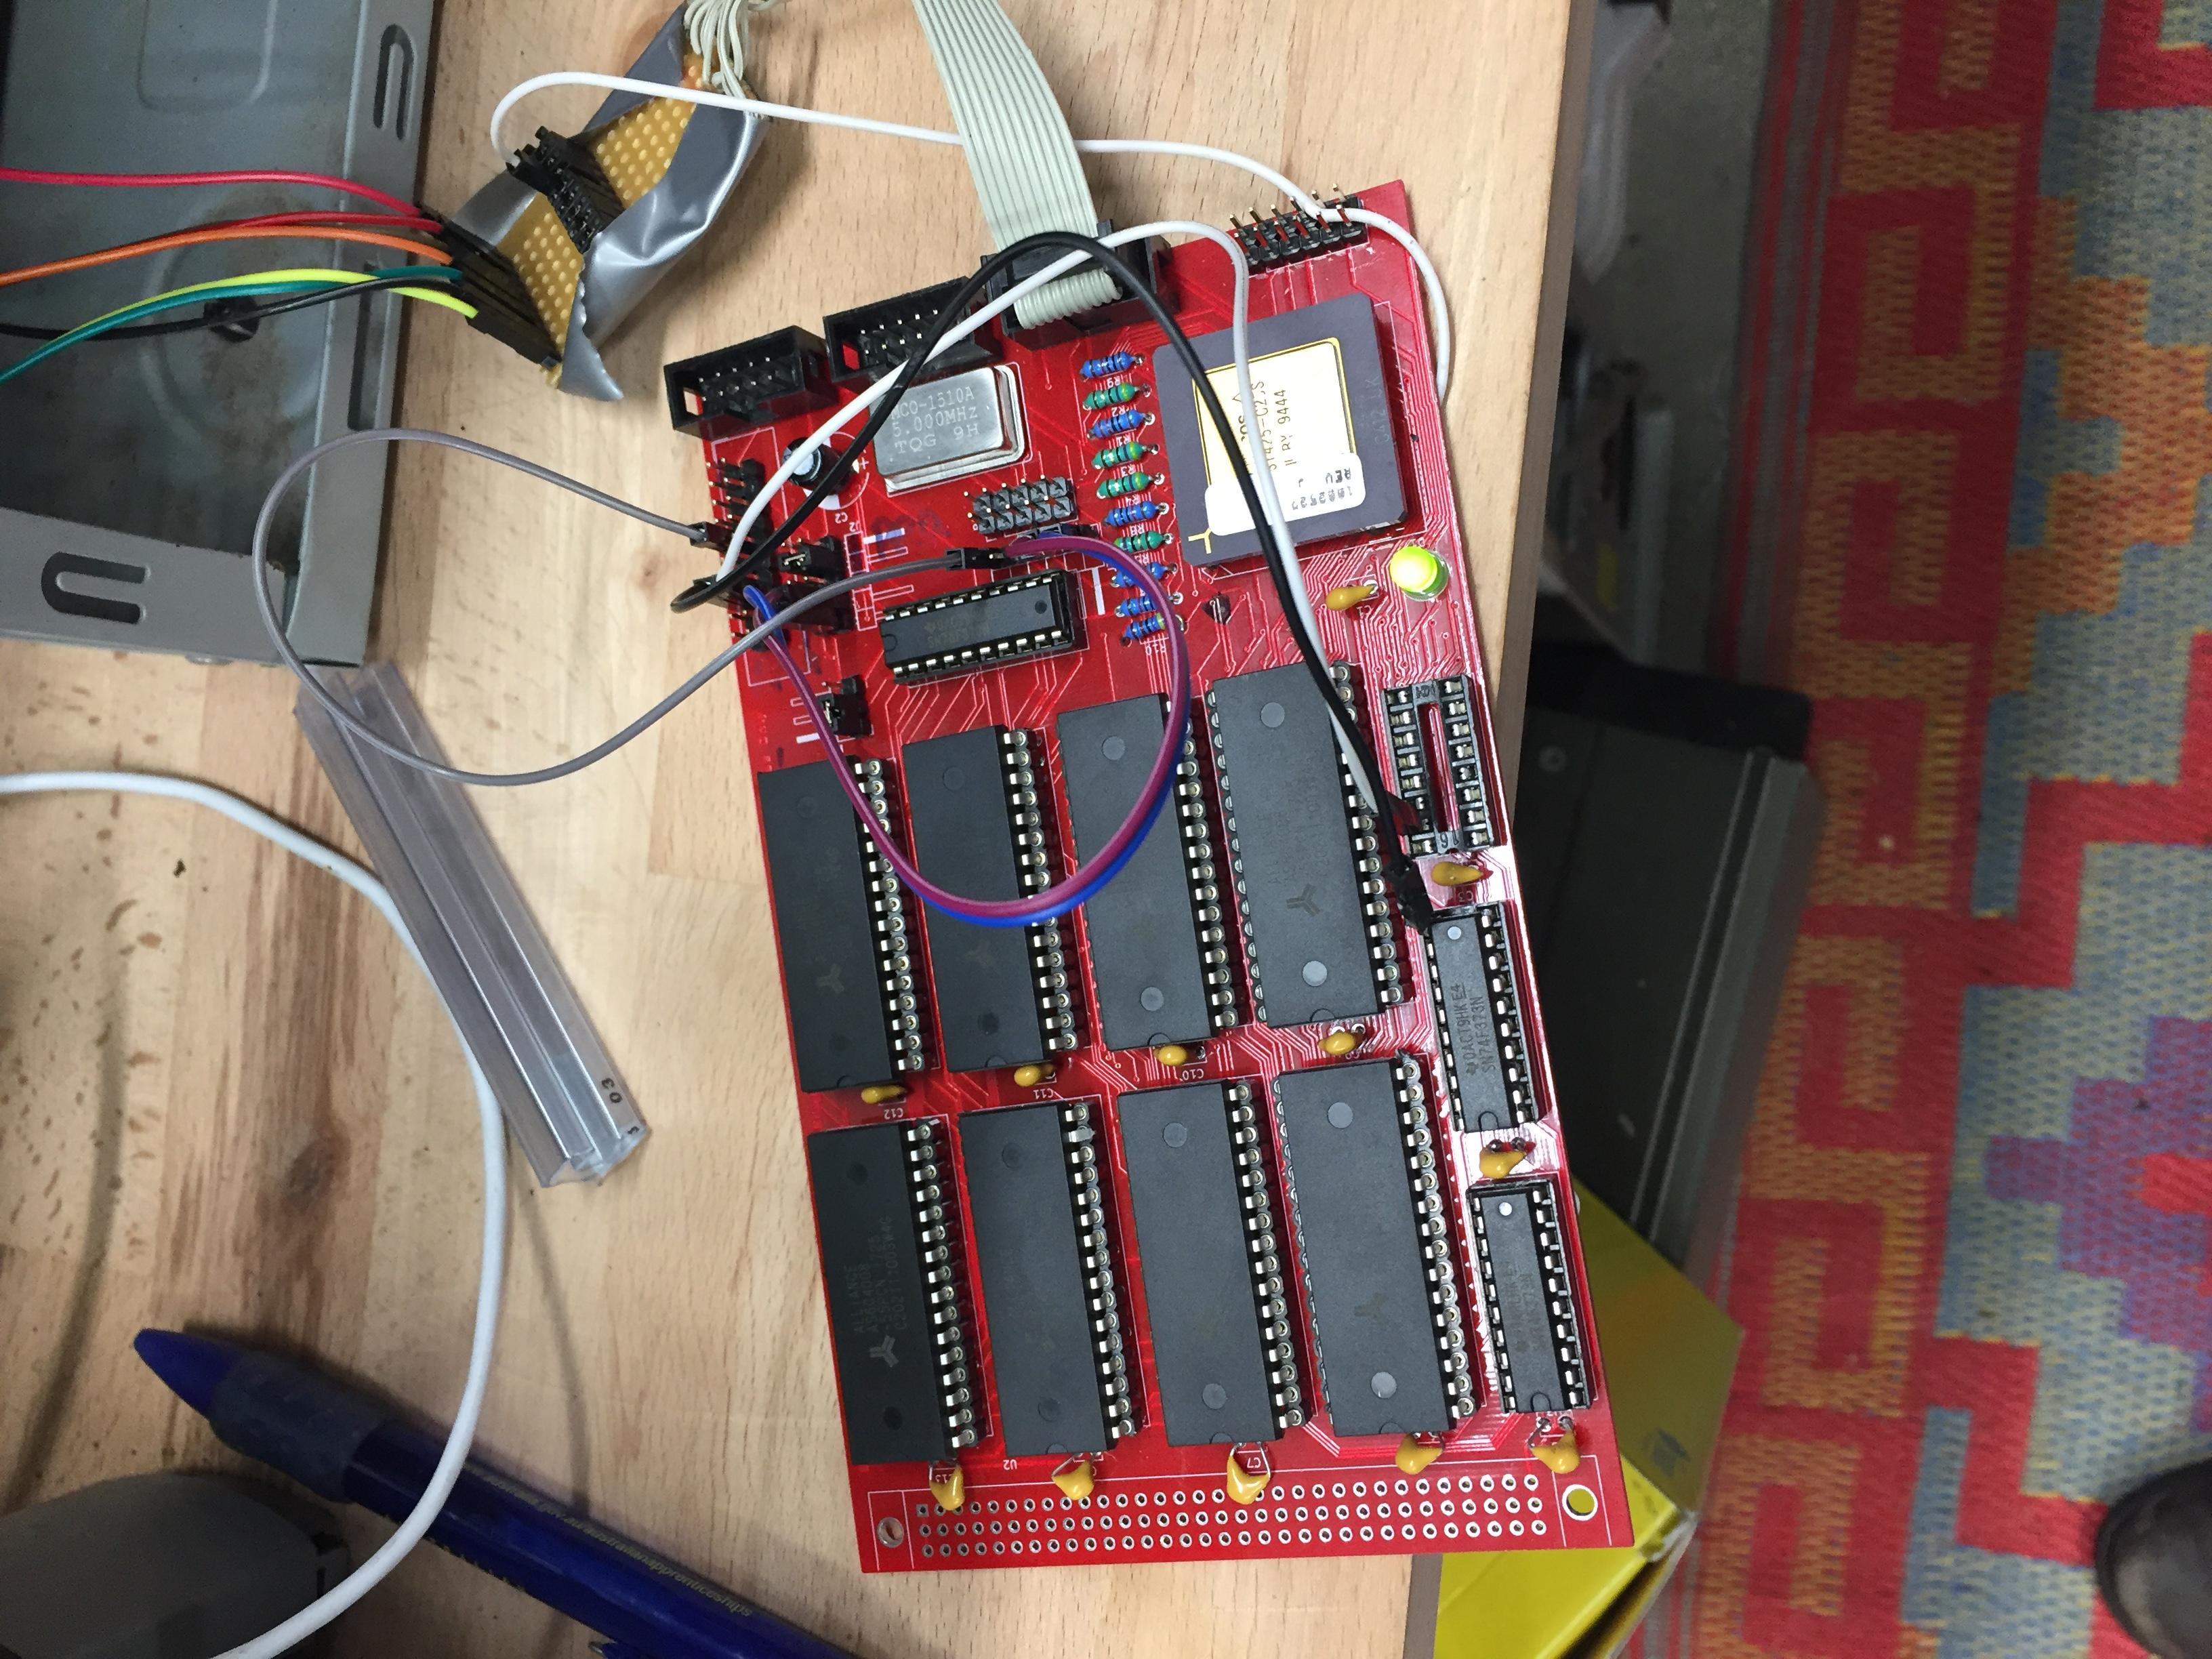 www.retrobrewcomputers.org_lib_plugins_ckgedit_fckeditor_userfiles_image_builderpages_trick-1_img_8122.jpg